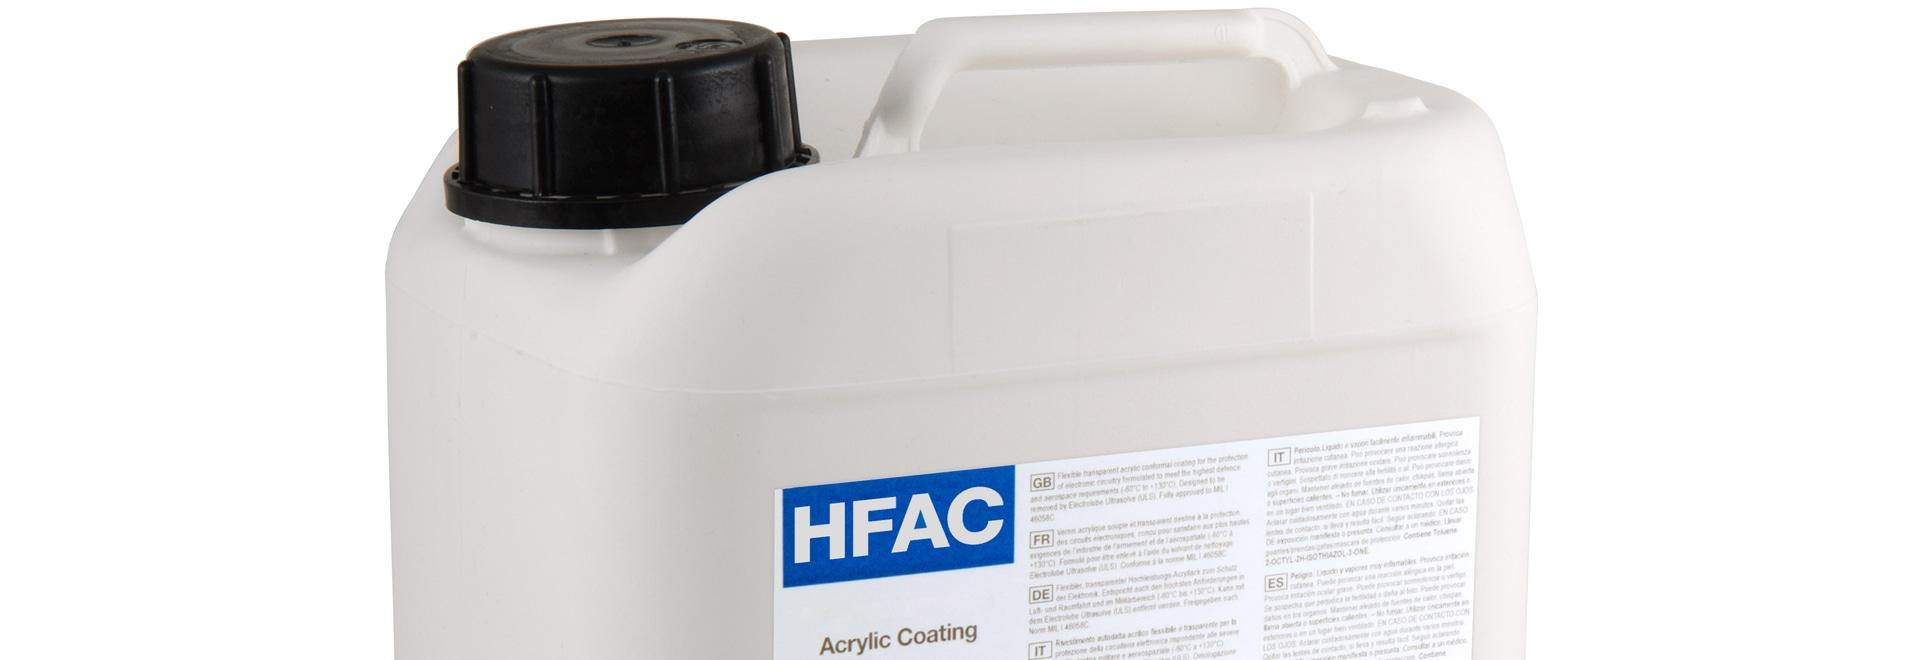 HFAC 5 litres